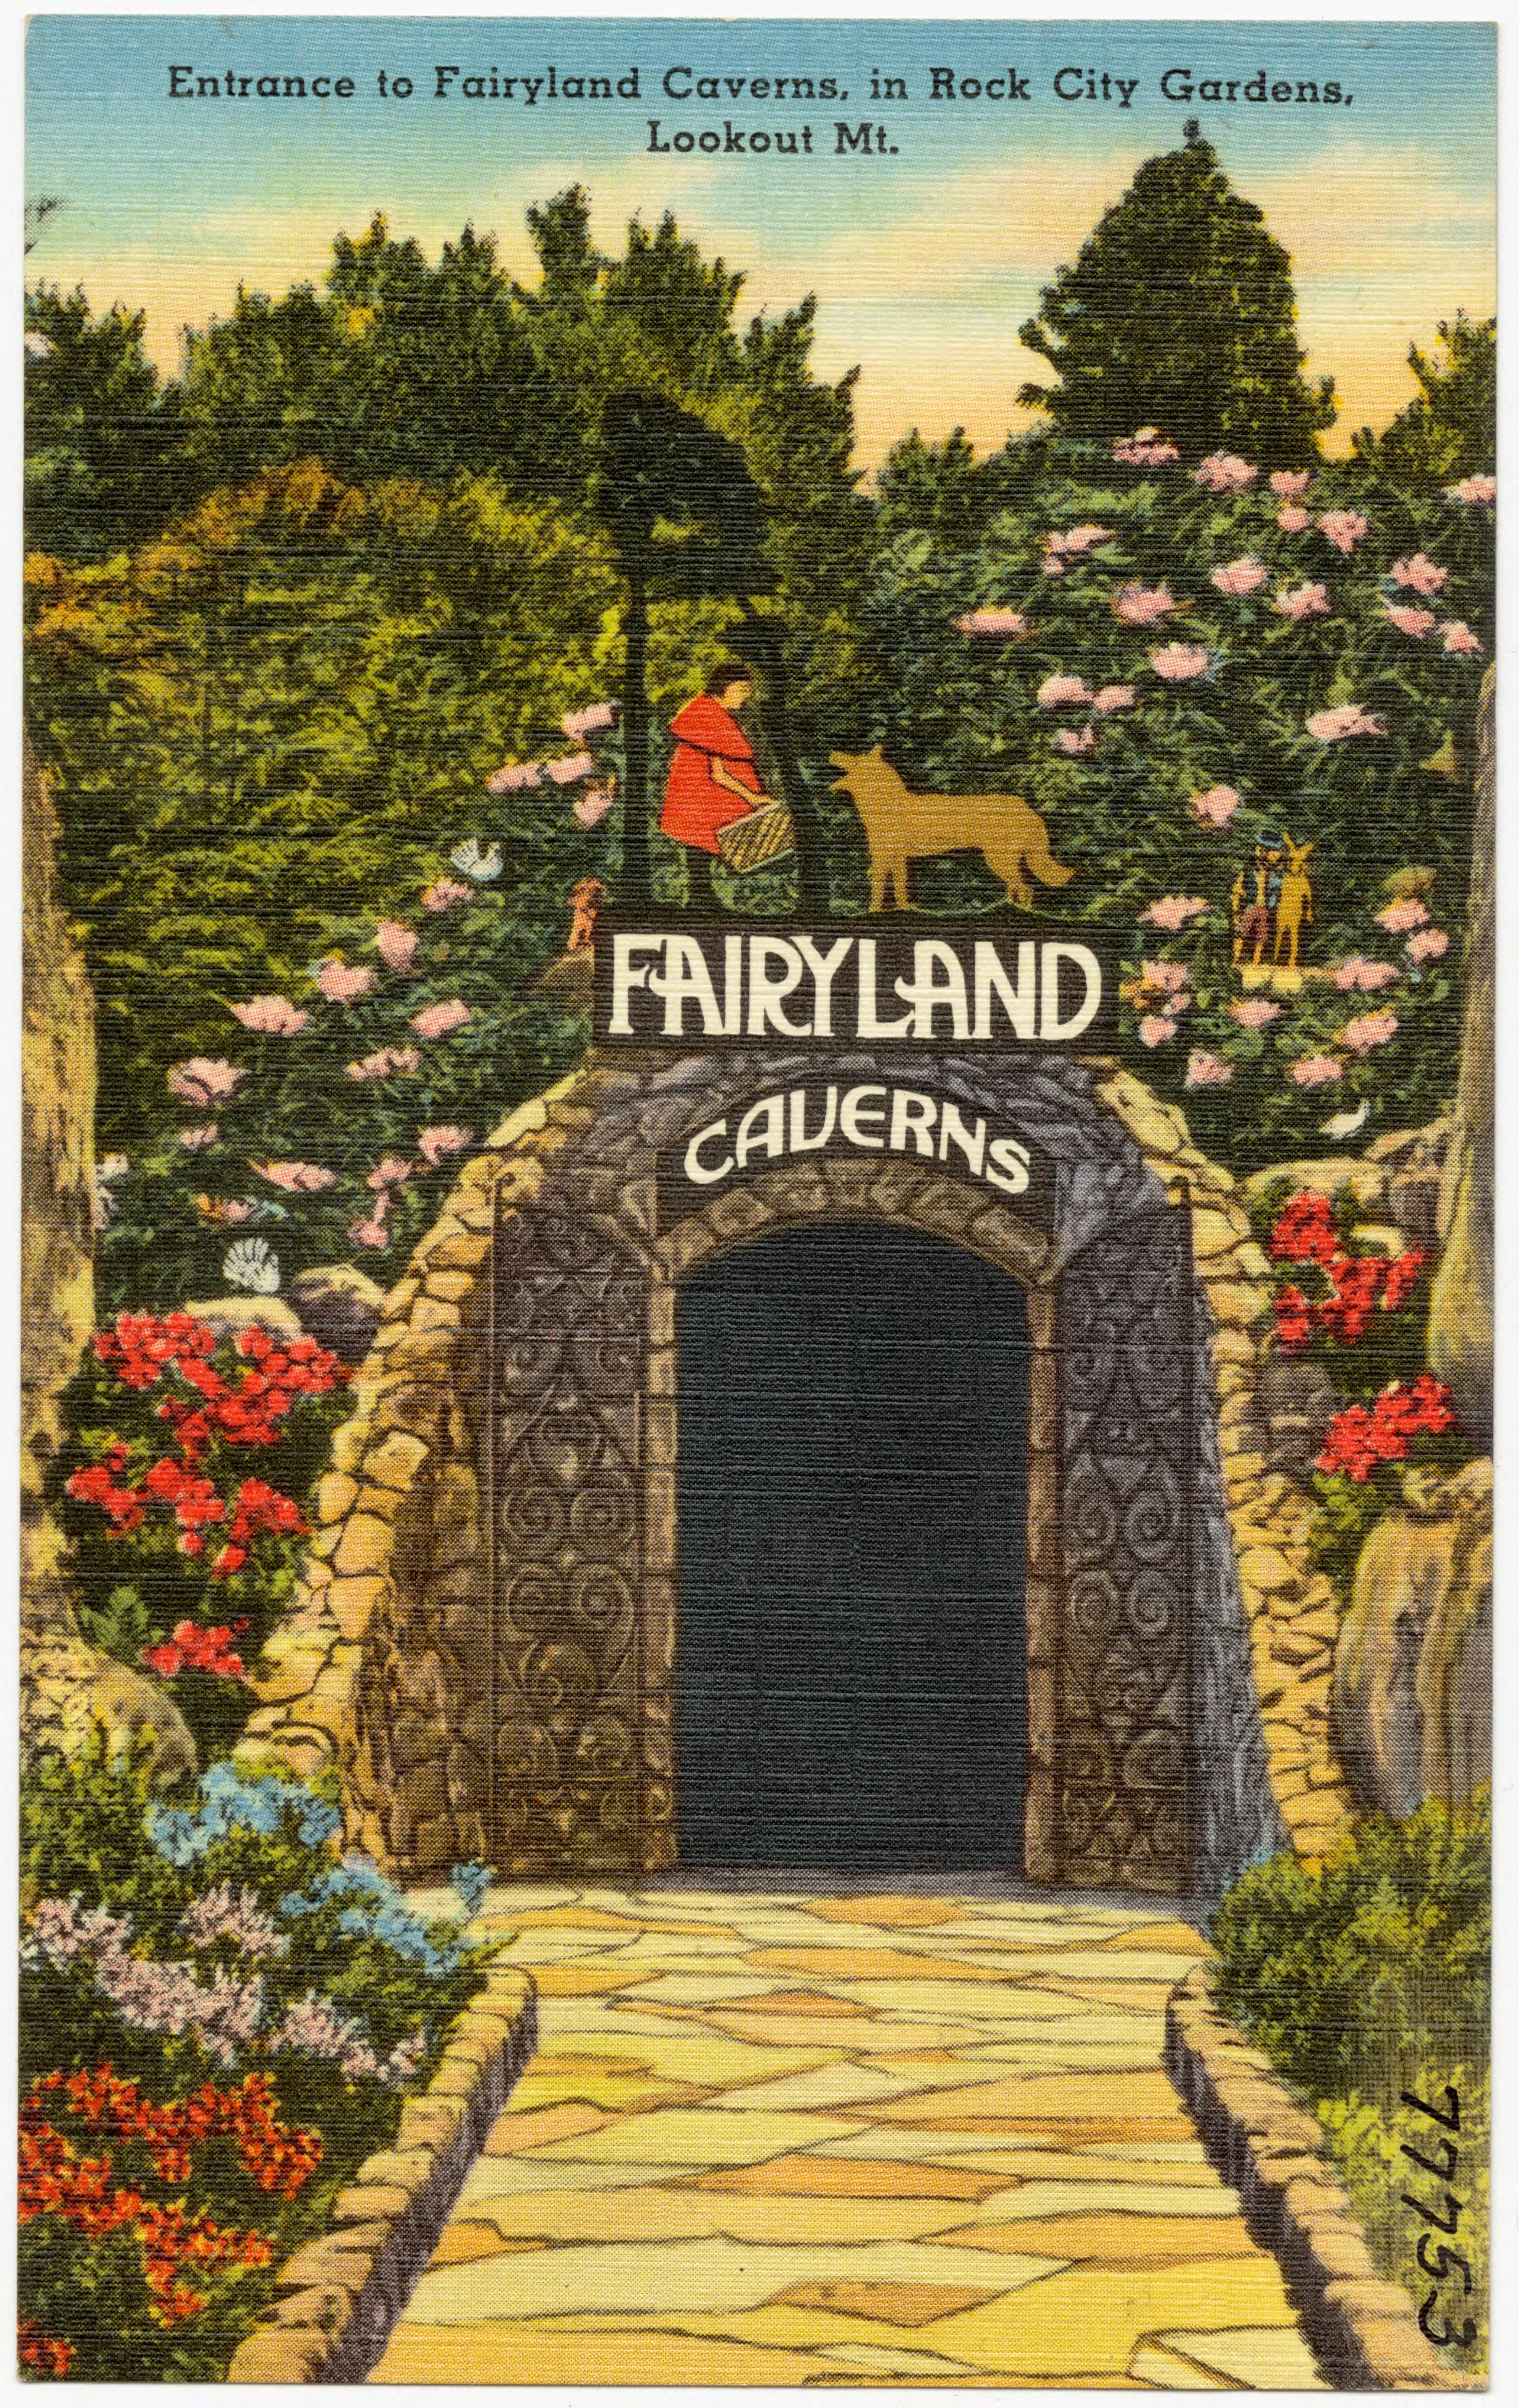 Fairyland Caverns in Rock City Gardens – The Underground World of Caves